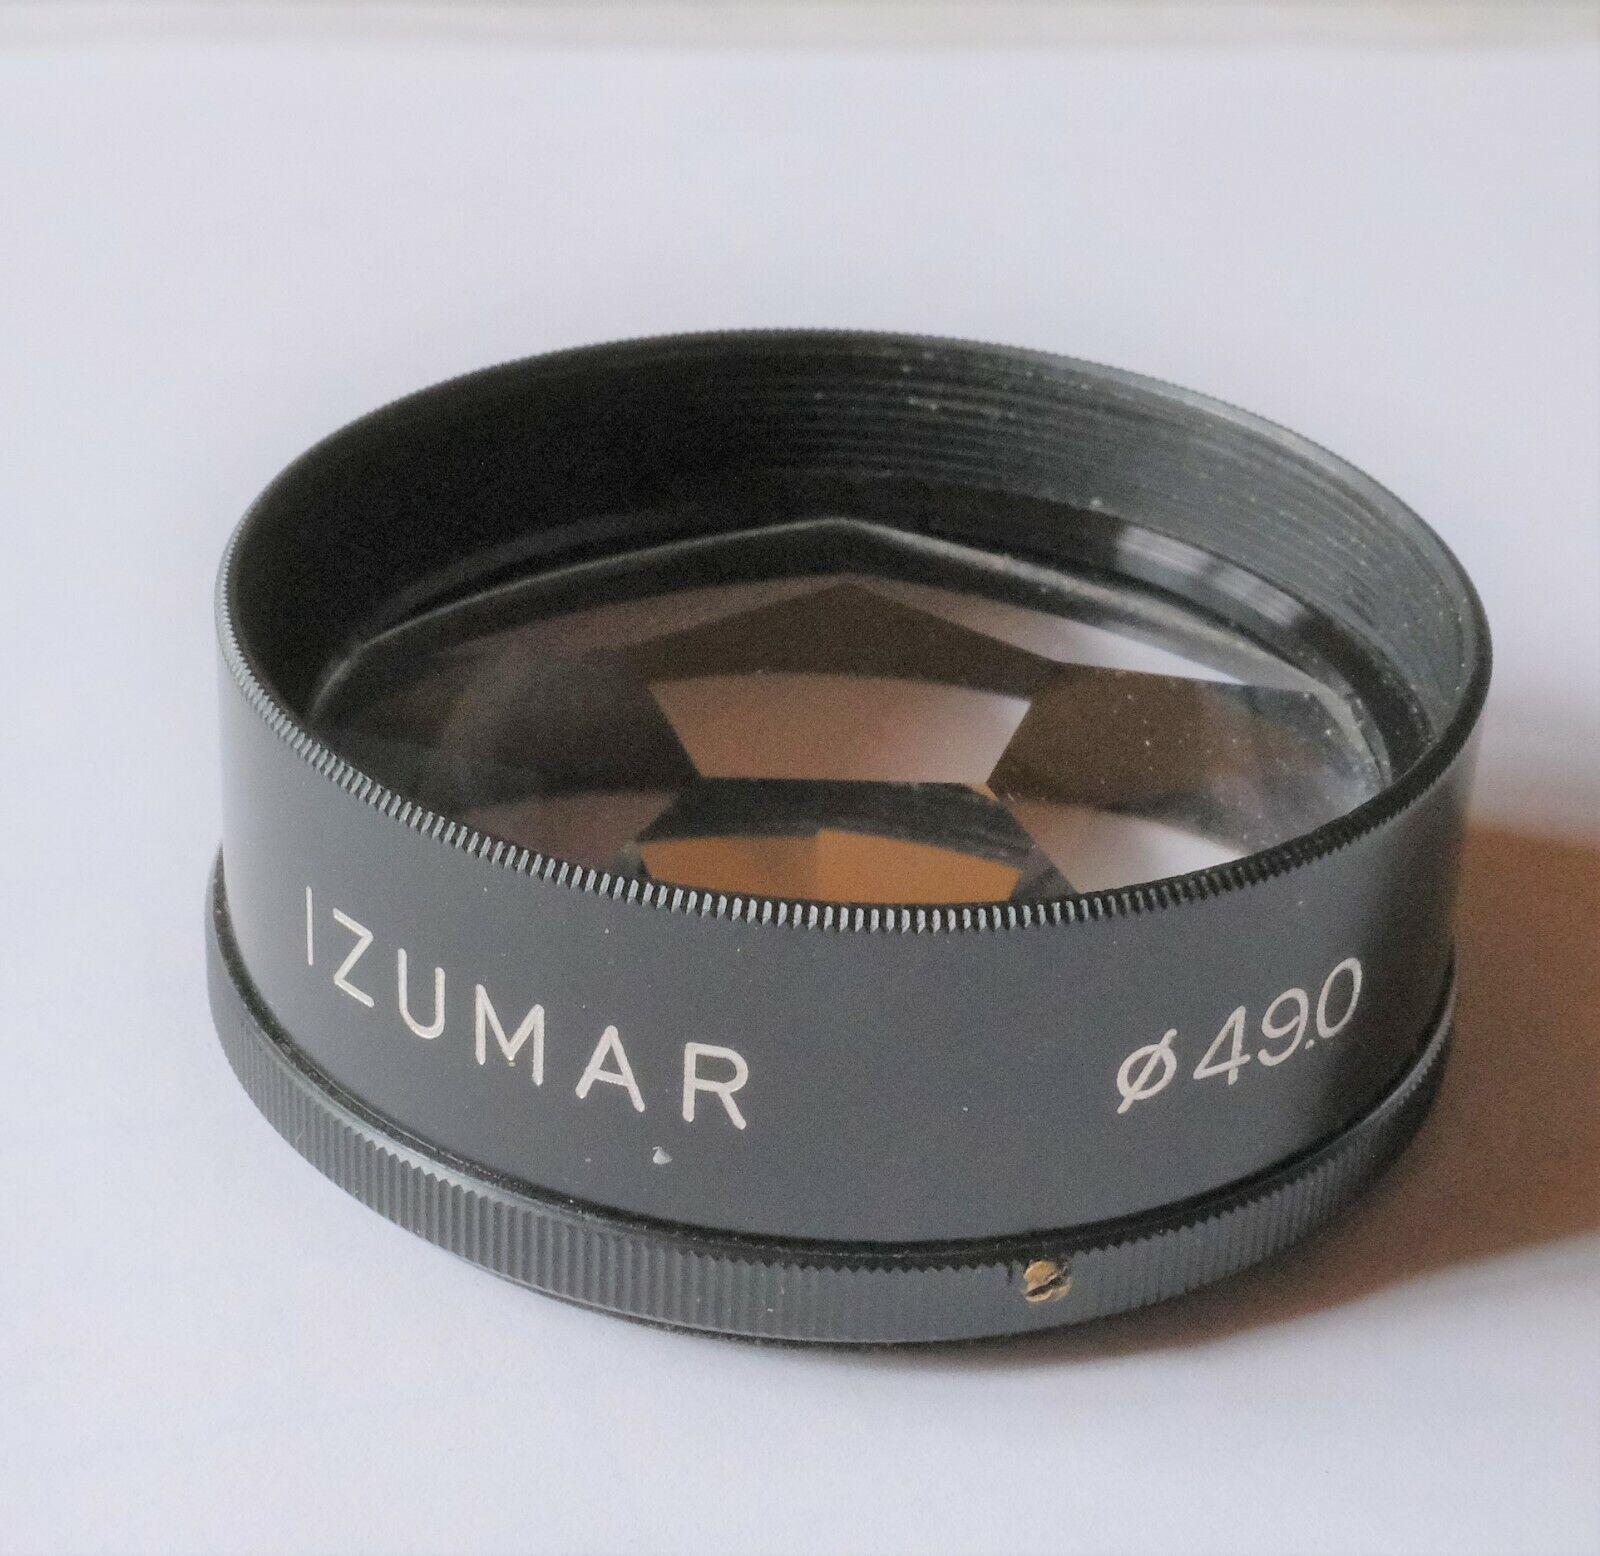 IZUMAR 49mm Effektfilter